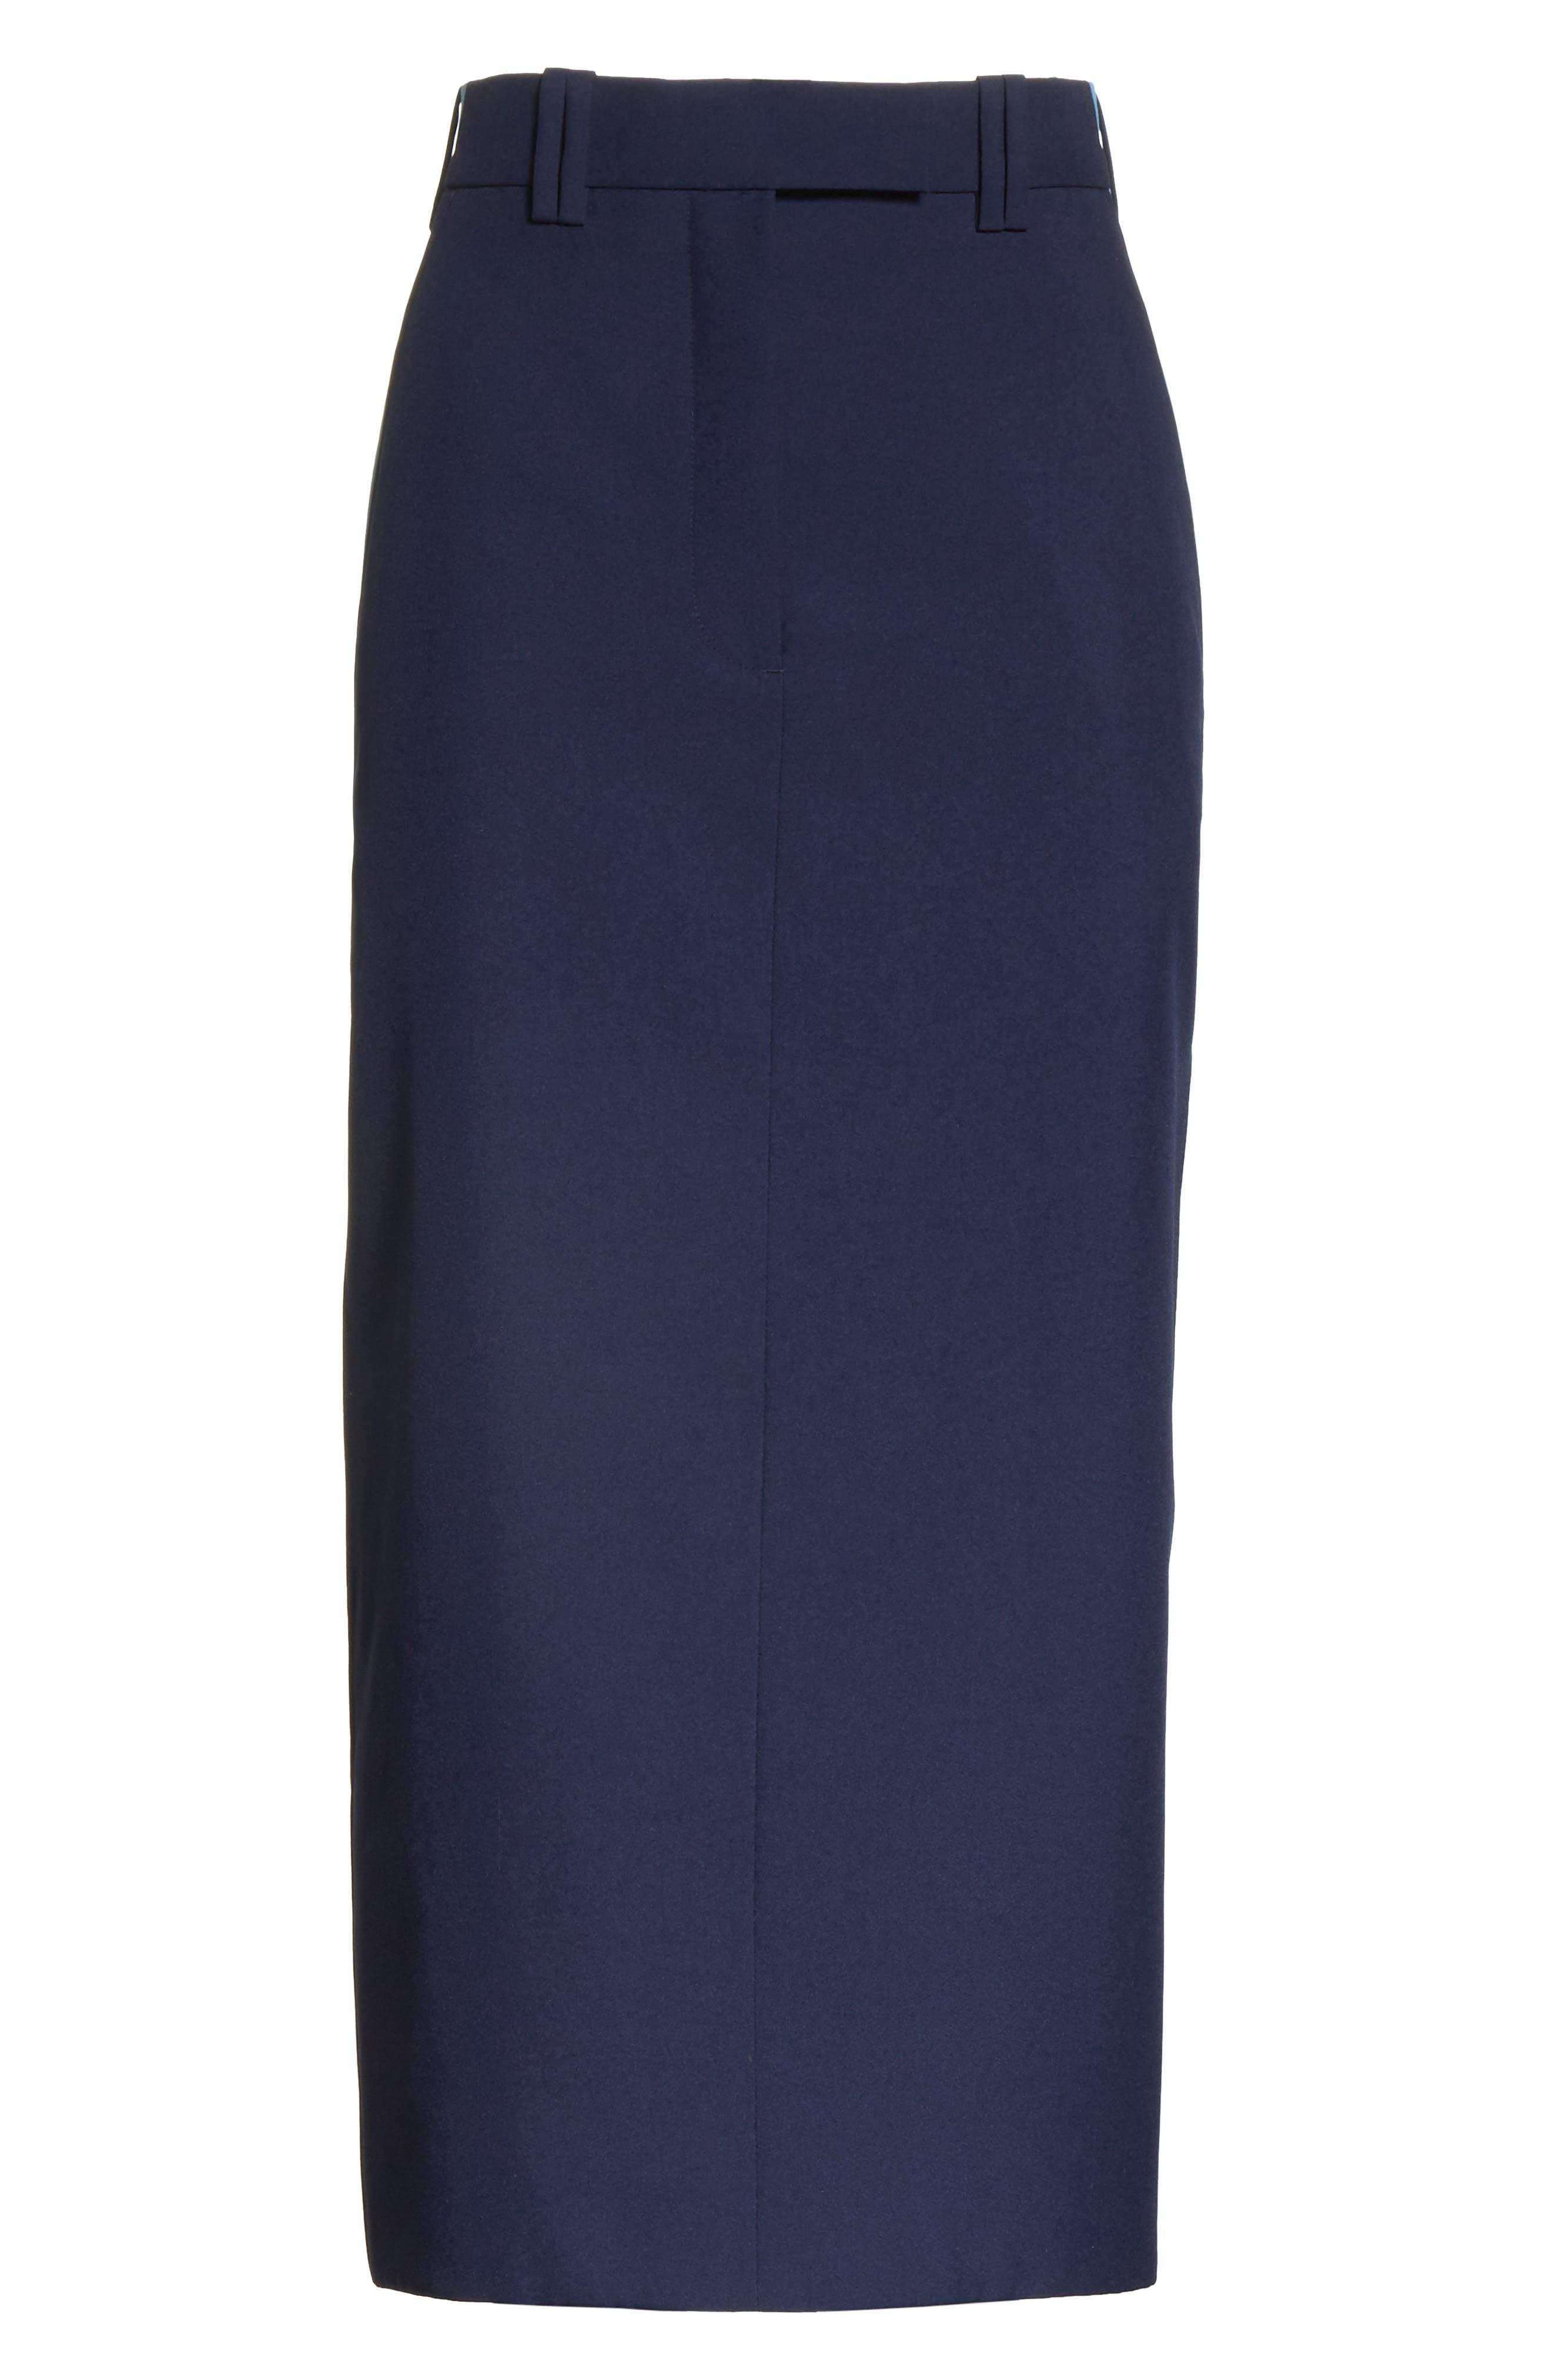 Uniform Midi Skirt,                             Alternate thumbnail 6, color,                             Marine